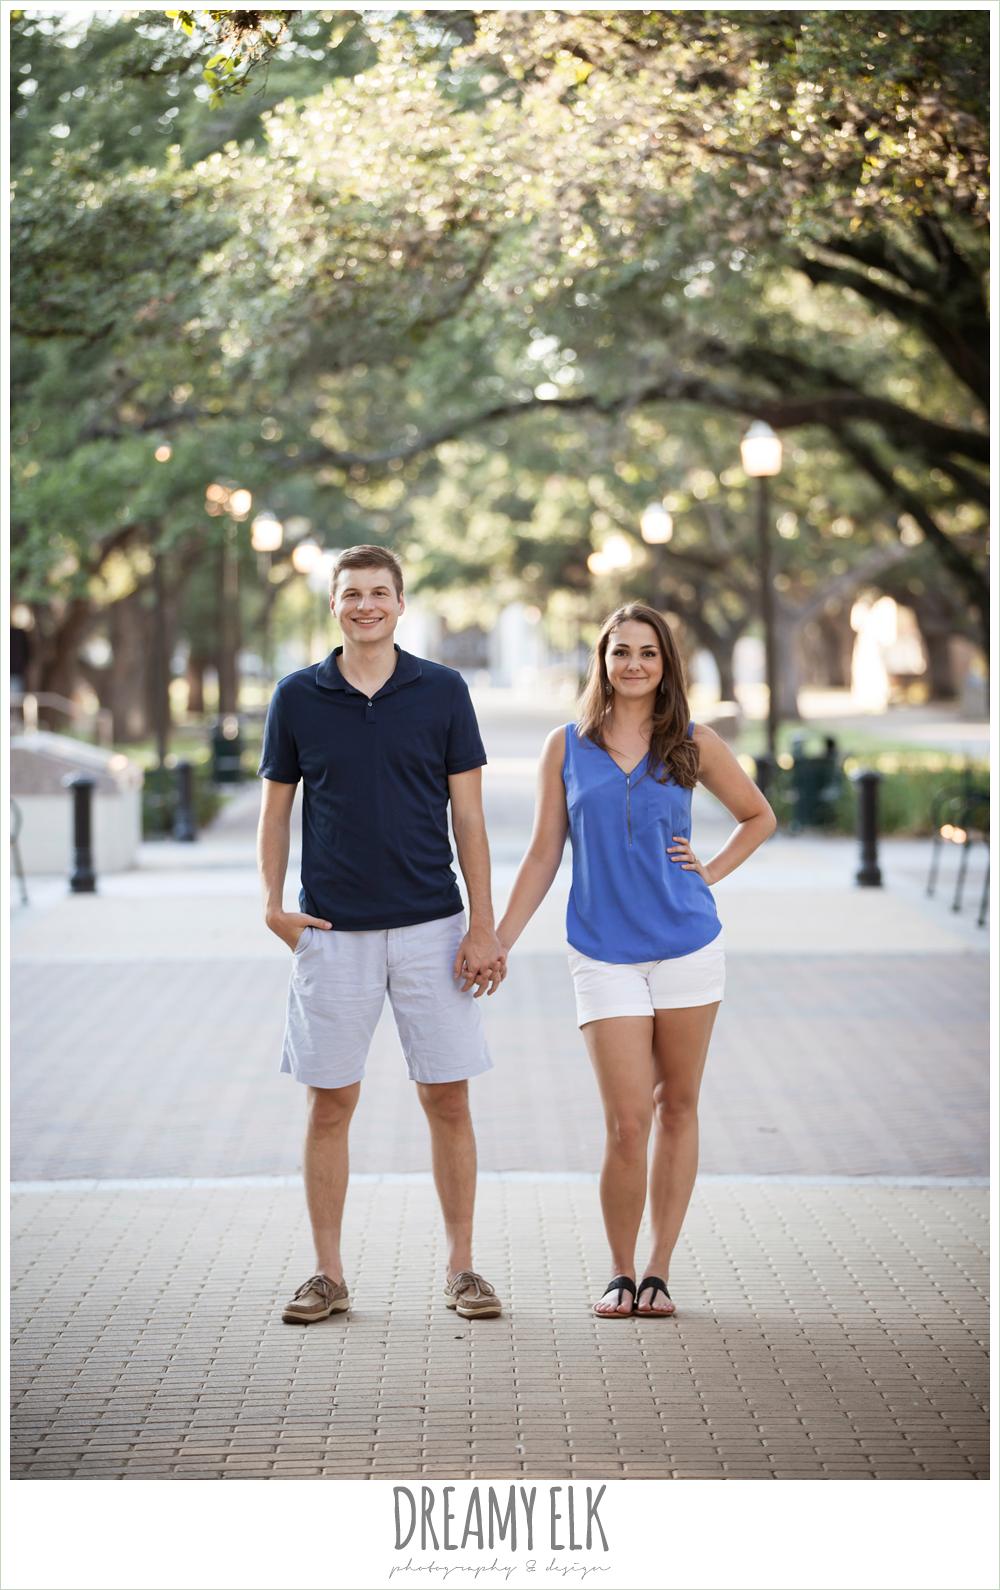 casual wardrobe, texas a&m campus, military walk, texas {dreamy elk photography and design}